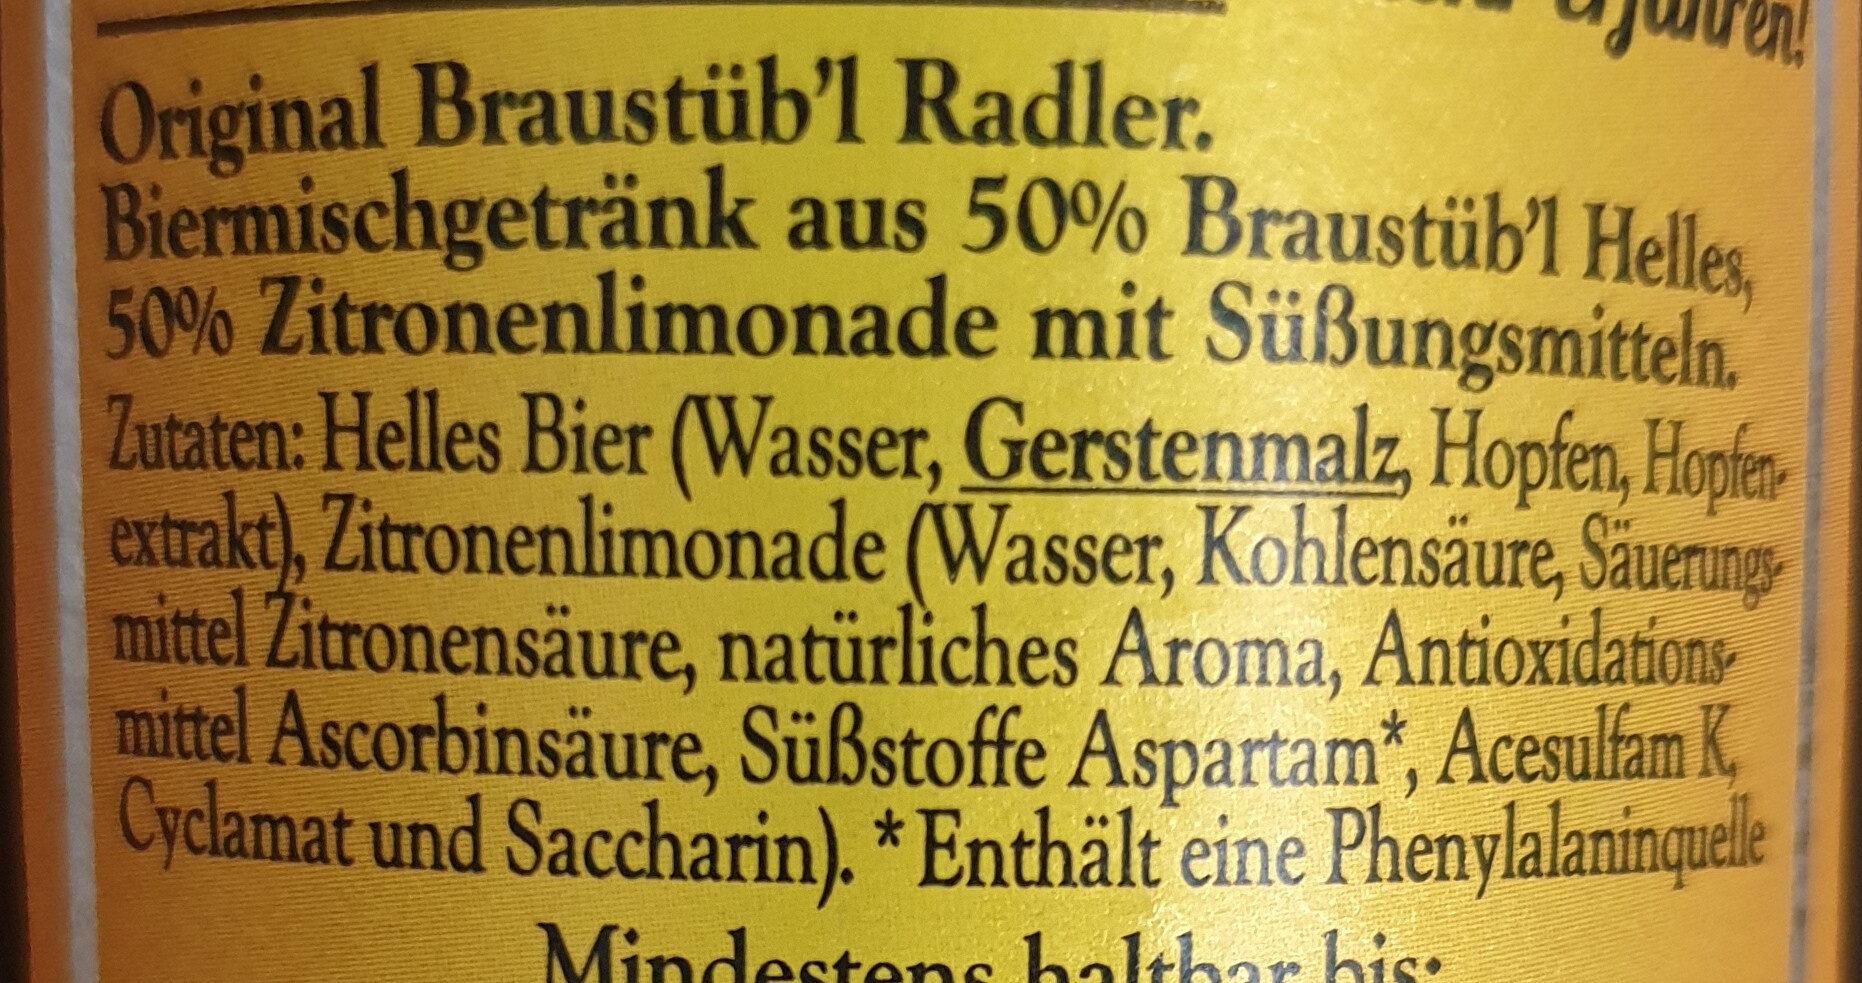 Braustüb'l Radler - Ingredients